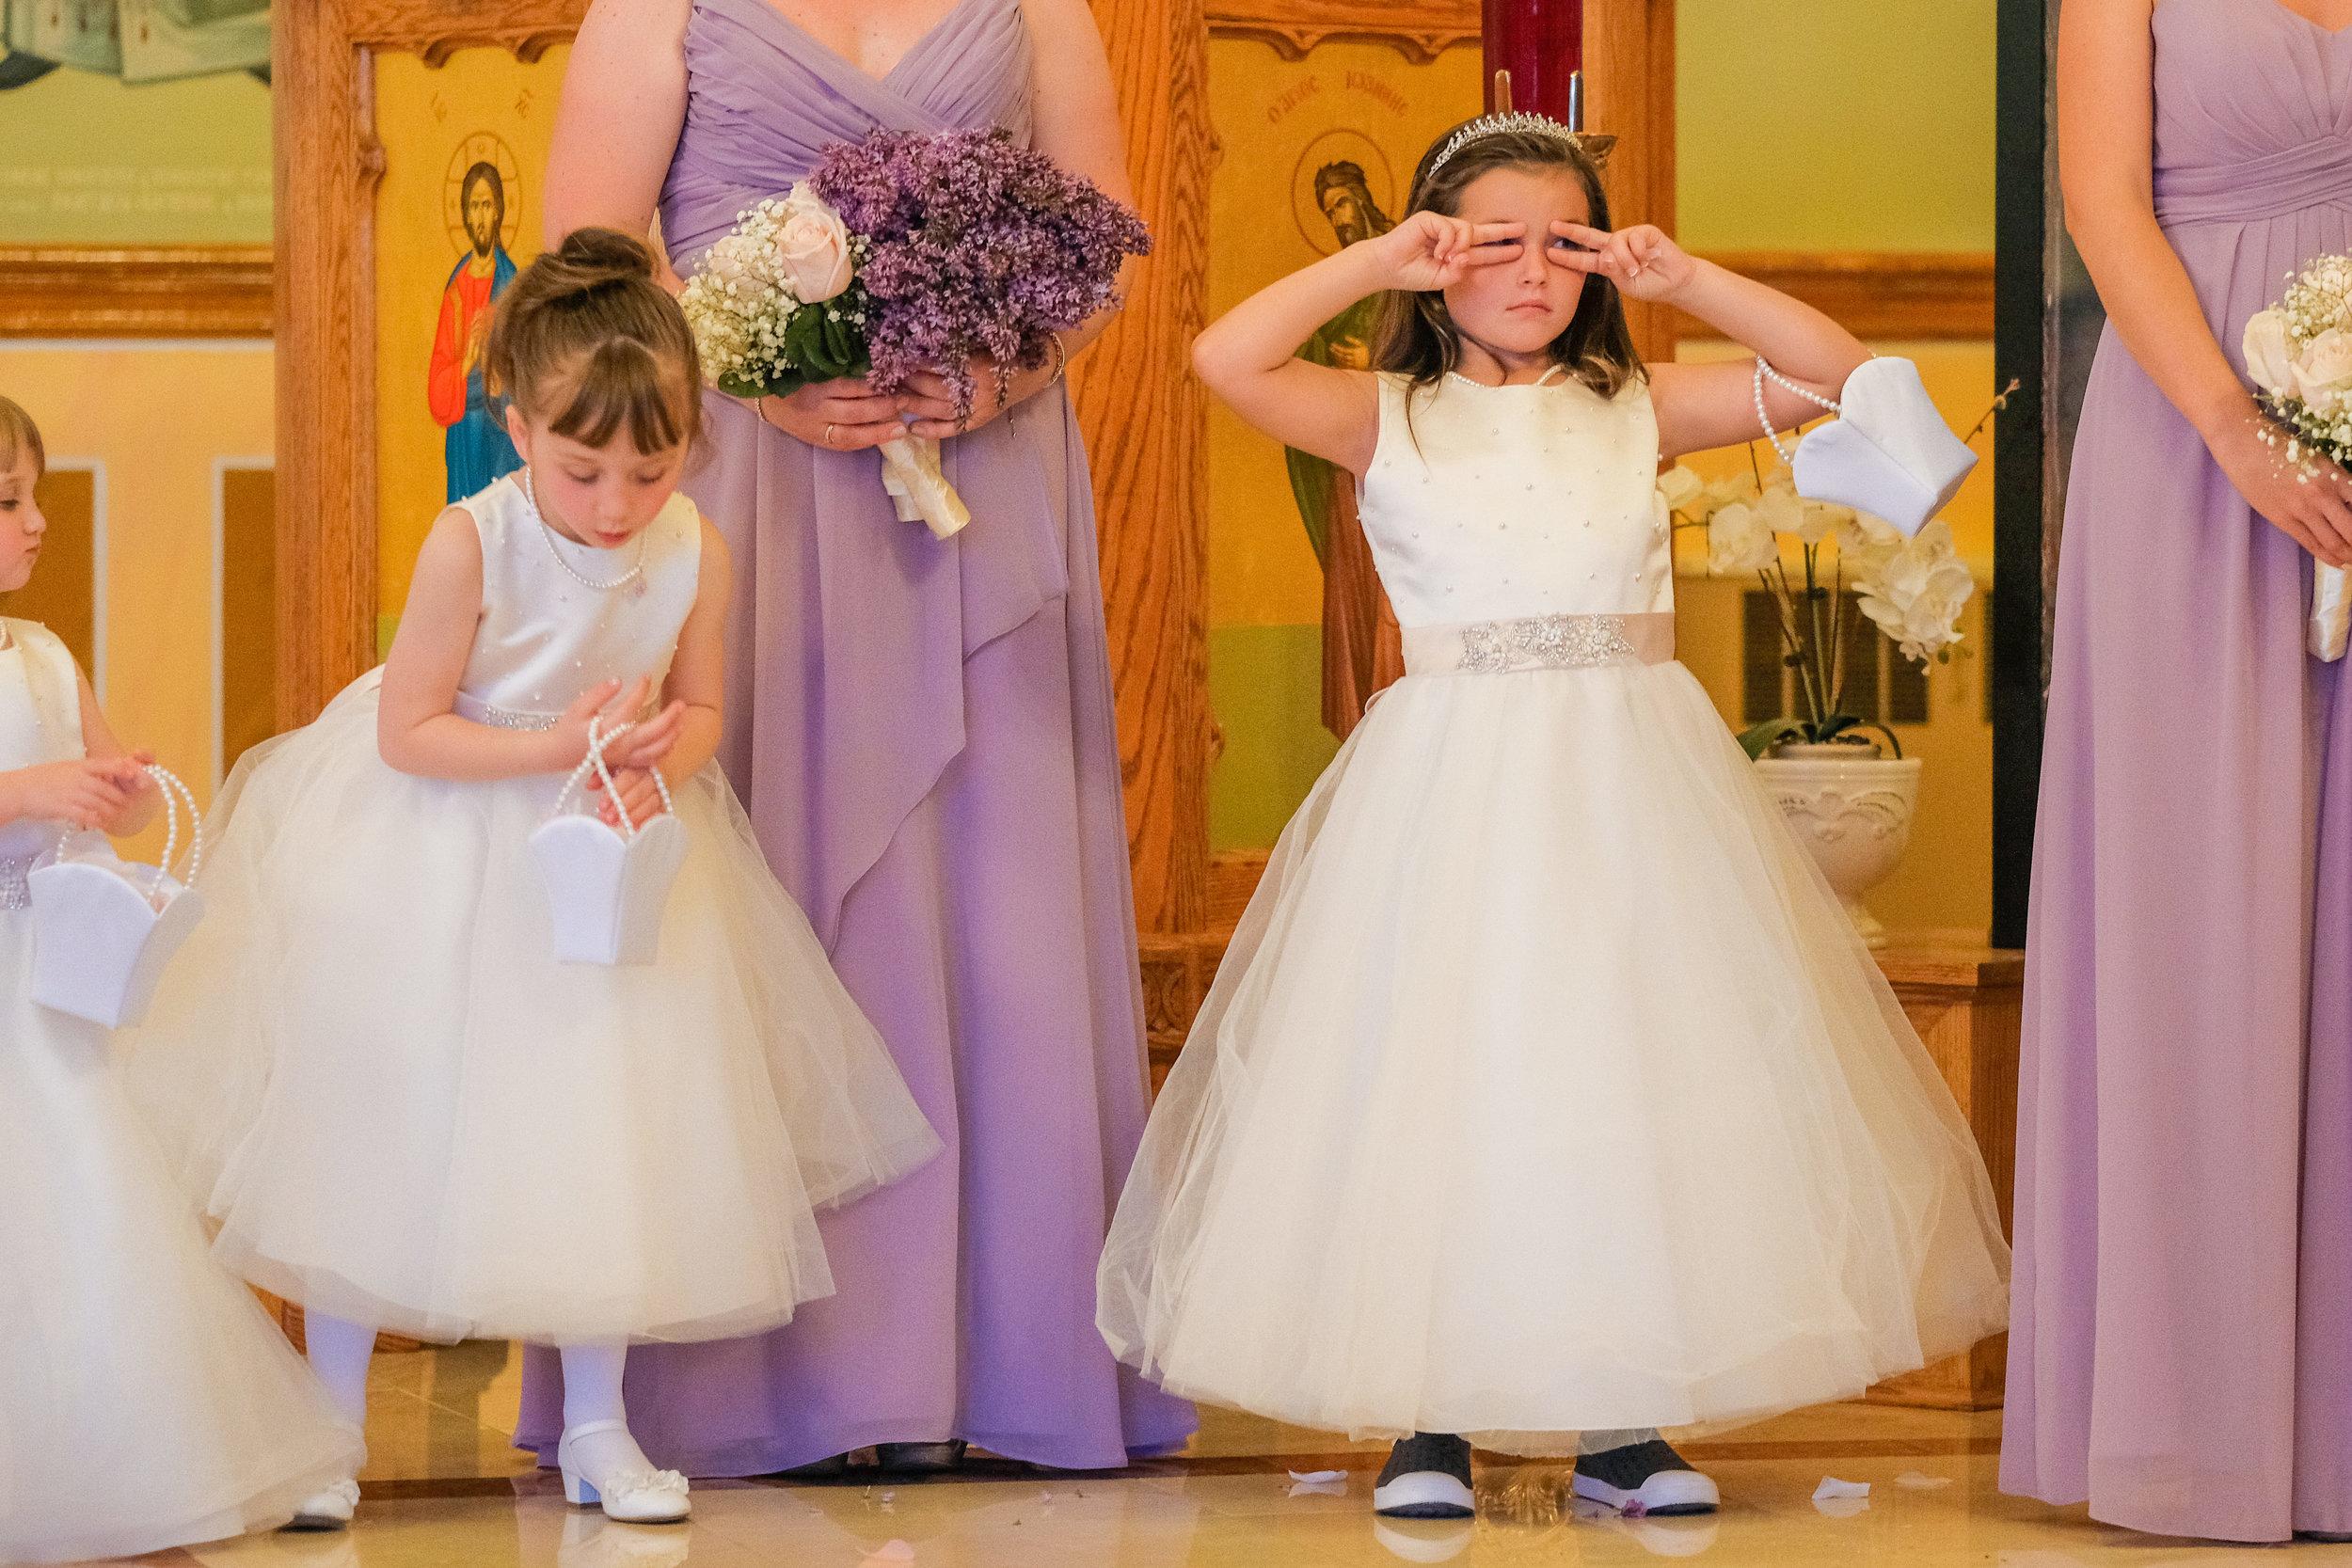 lyman-estate-wedding-photography-32.jpg